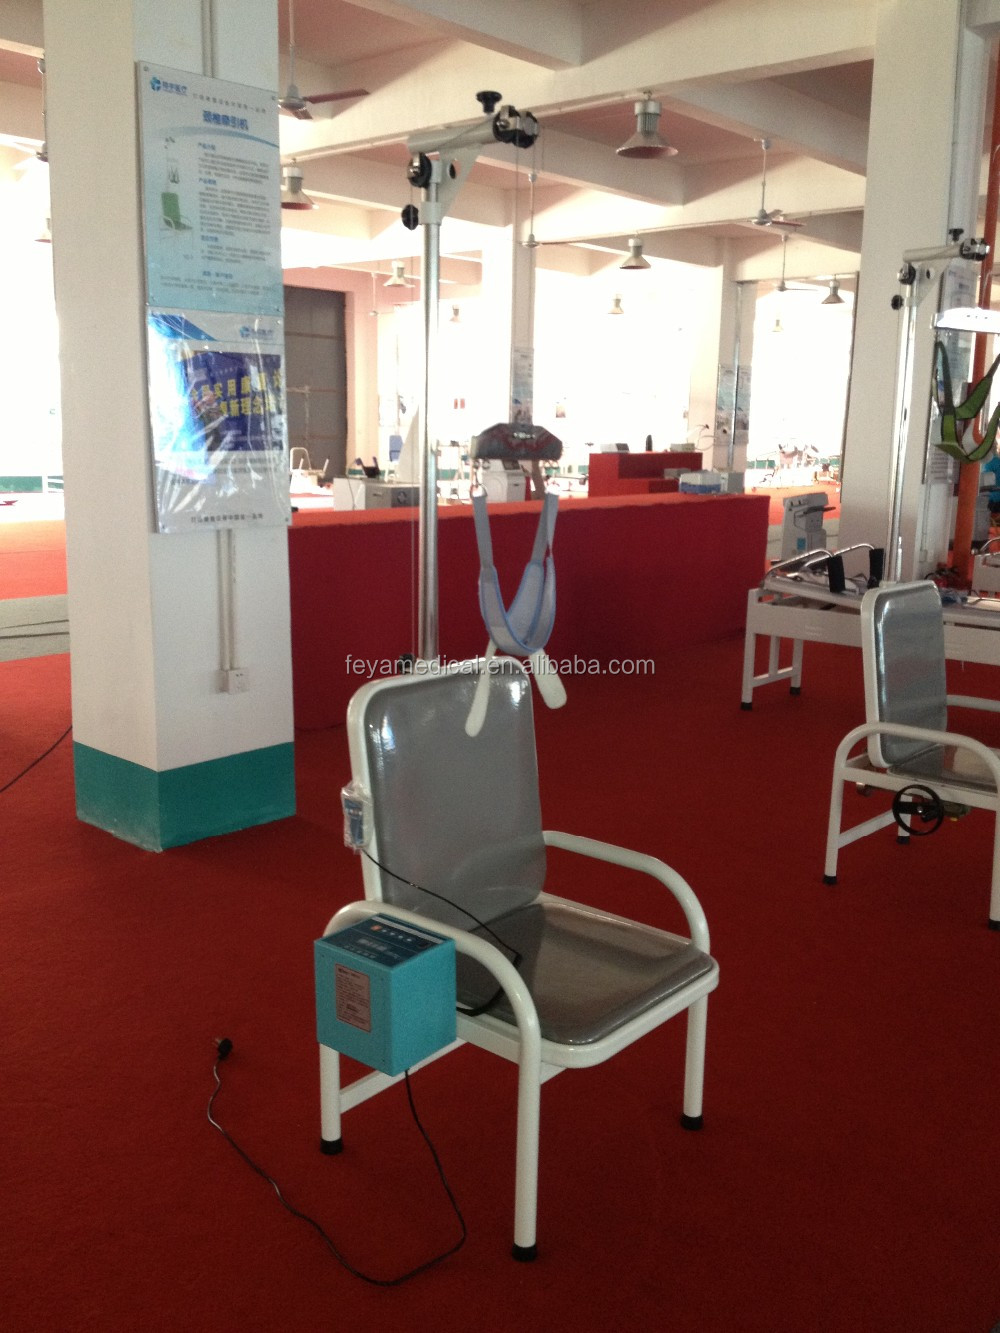 Fy Yz 4 Silla De Tracci N Cervical Fisioterapia Dispositivo De  # Muebles Fisioterapia